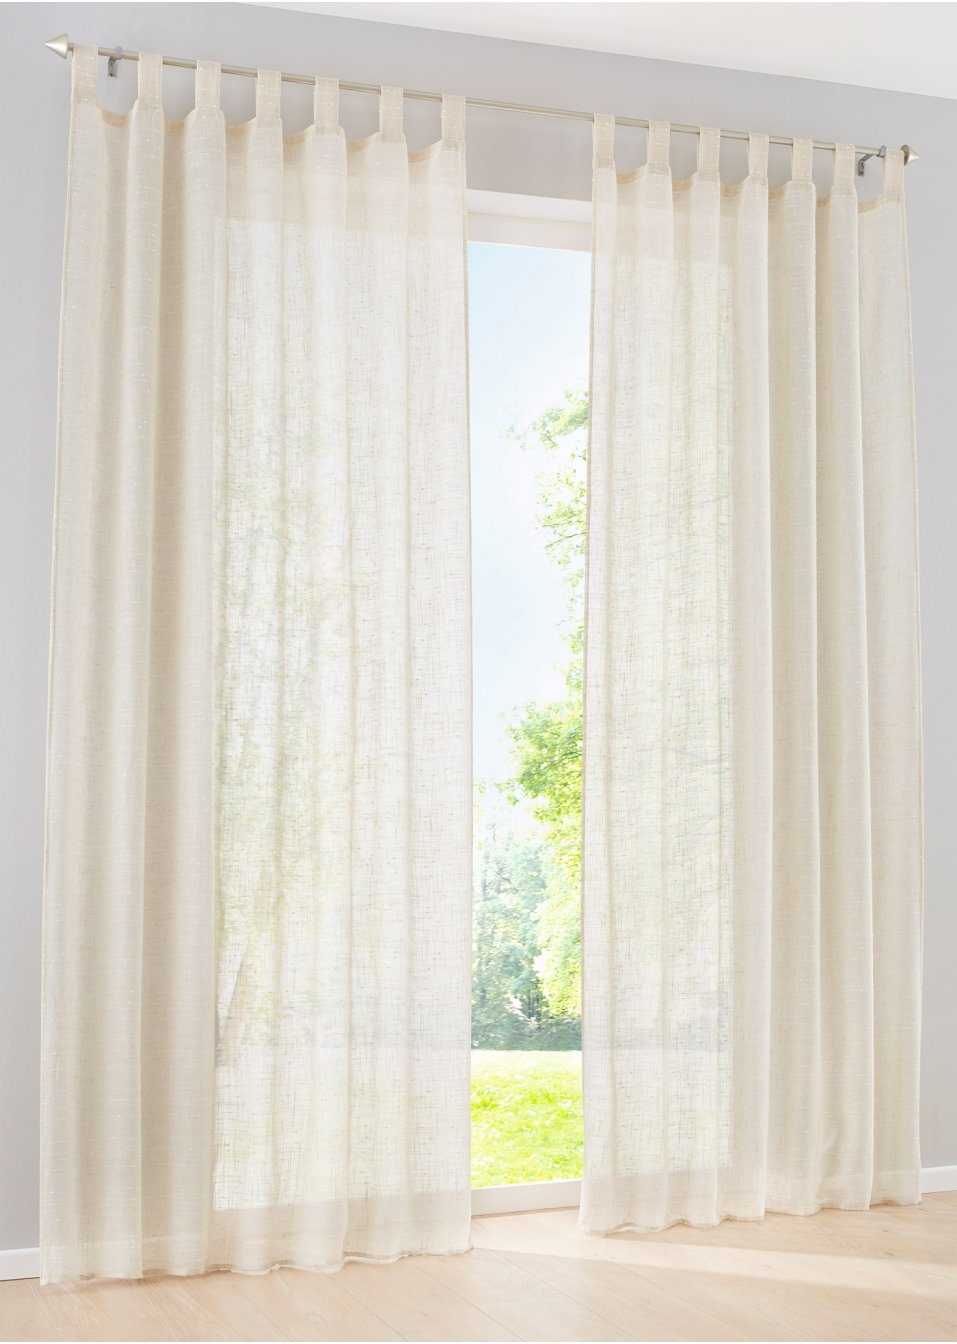 gardine leinen optik 1er pack natur bpc living online bestellen. Black Bedroom Furniture Sets. Home Design Ideas